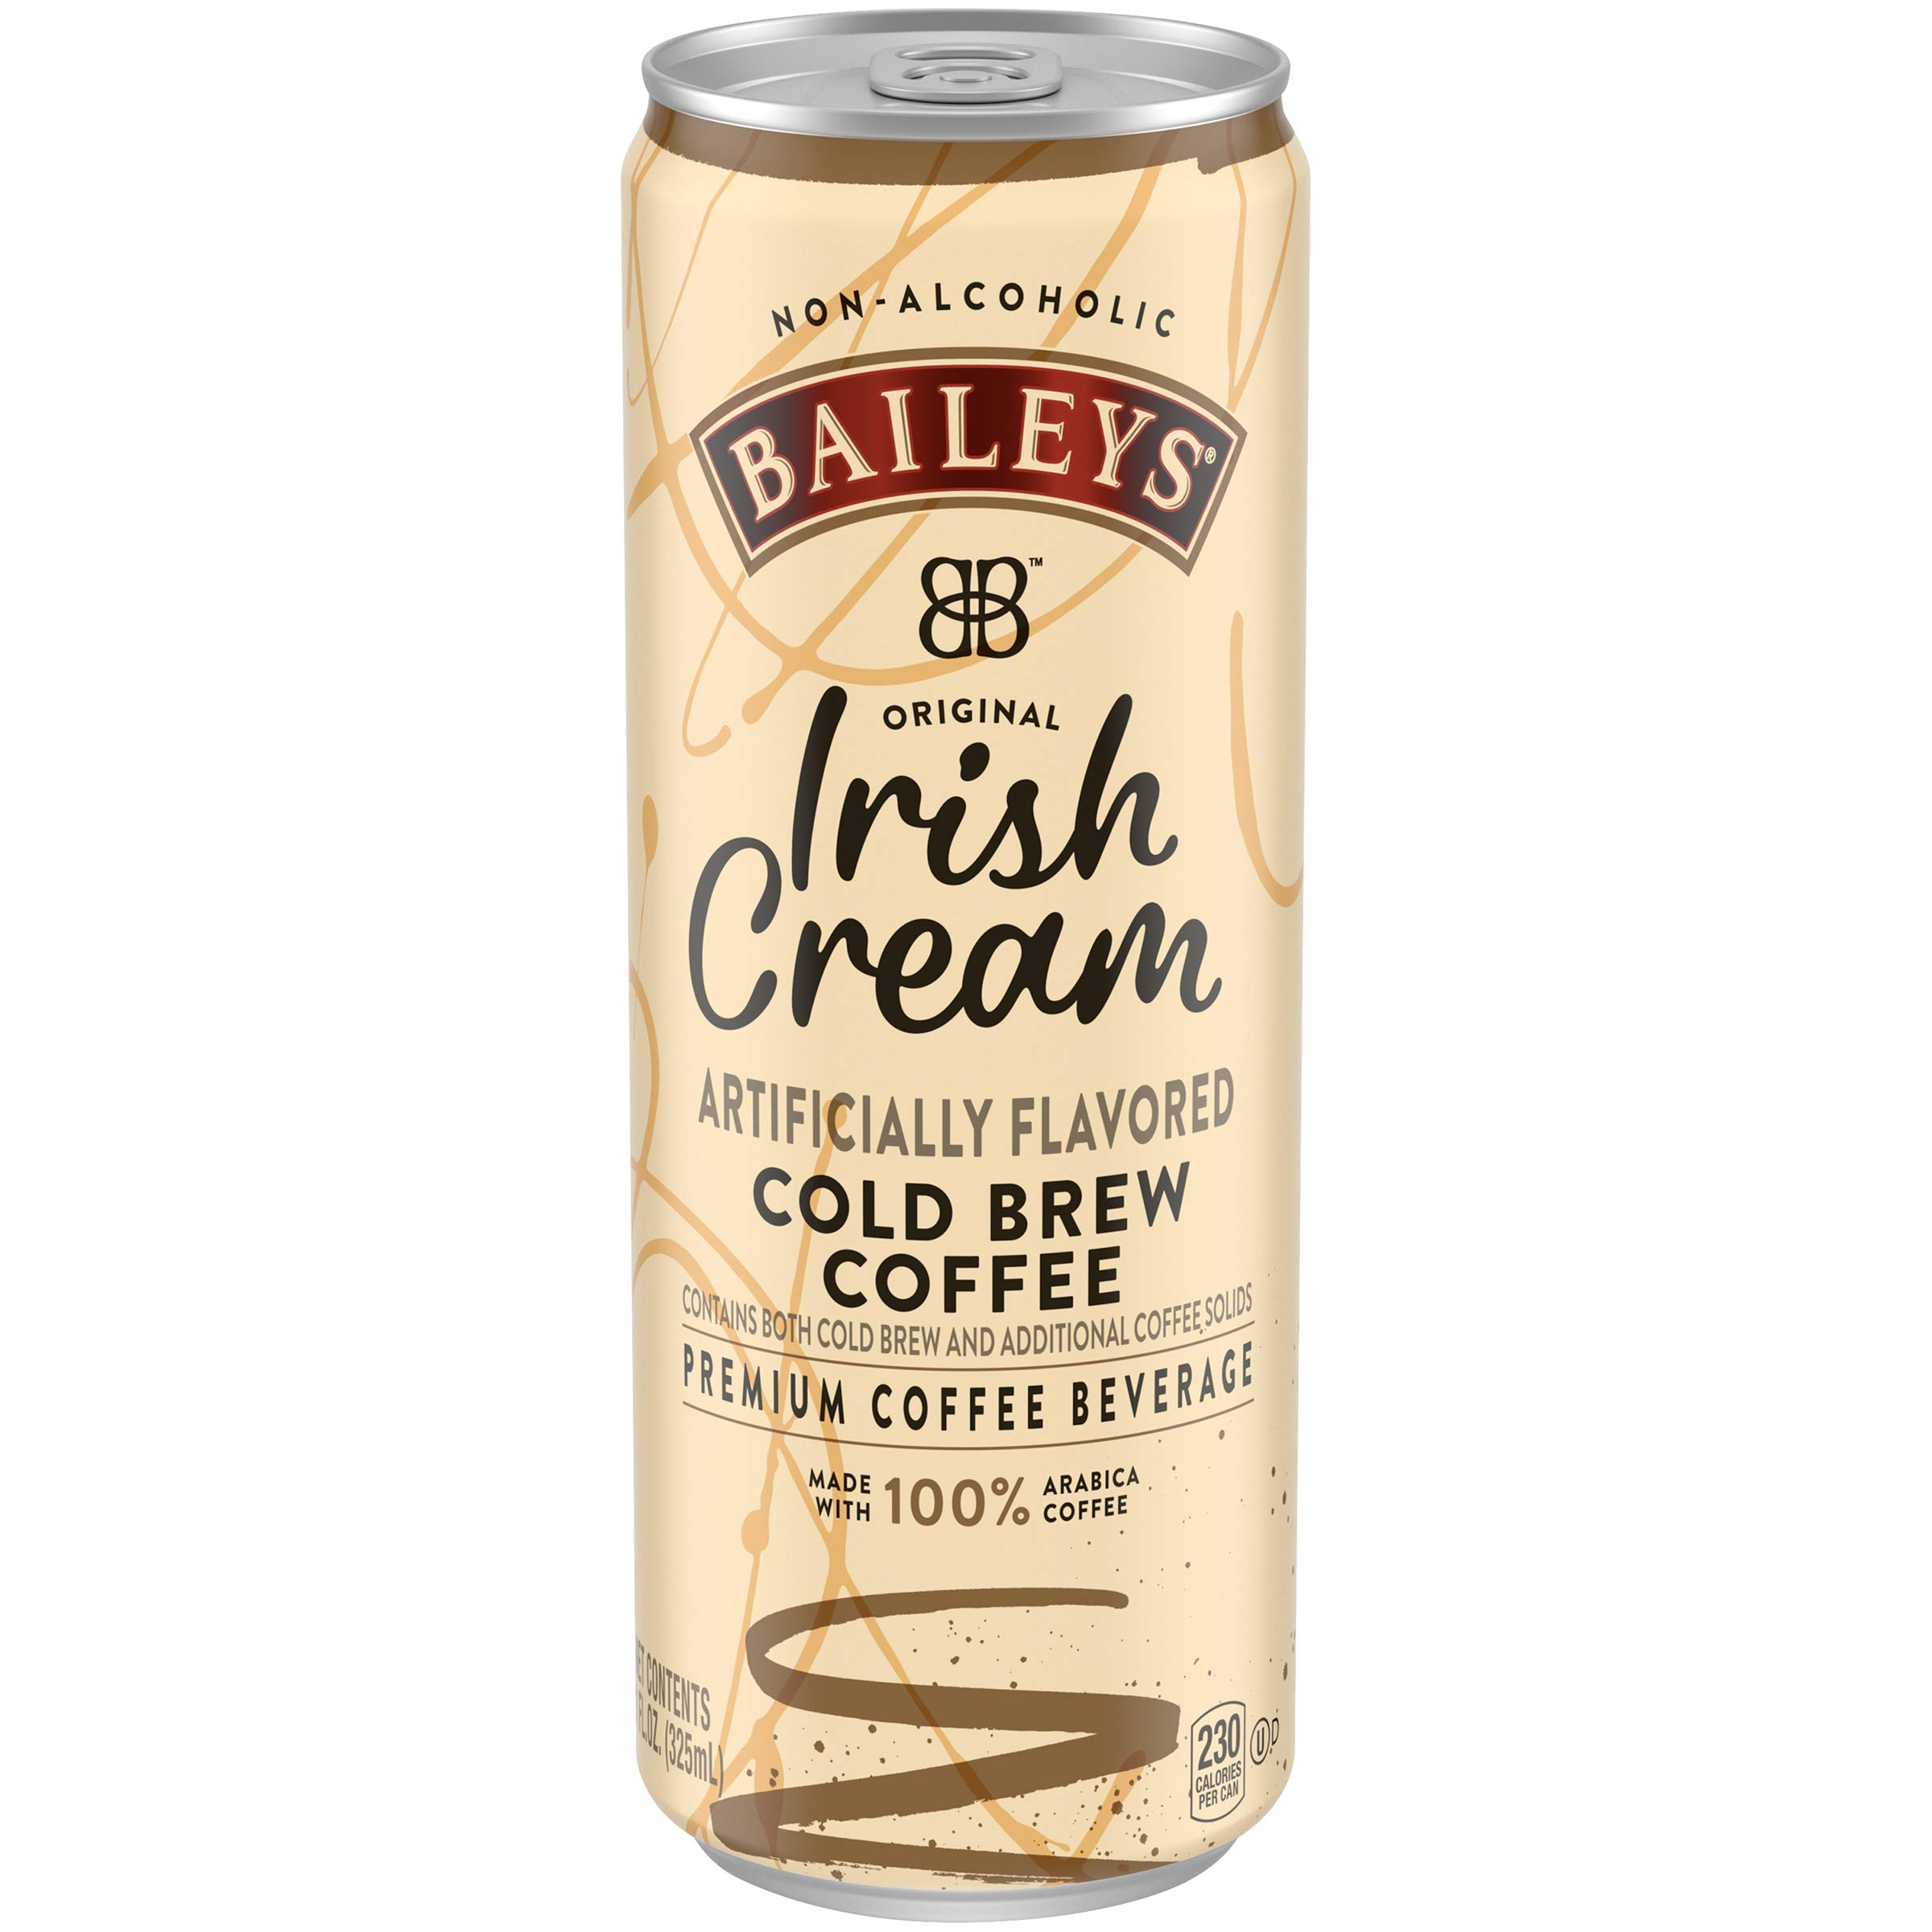 Baileys Non-Alcoholic Original Irish Cream Flavored Cold Brew Coffee, 11 fl oz can (Pack of 12)